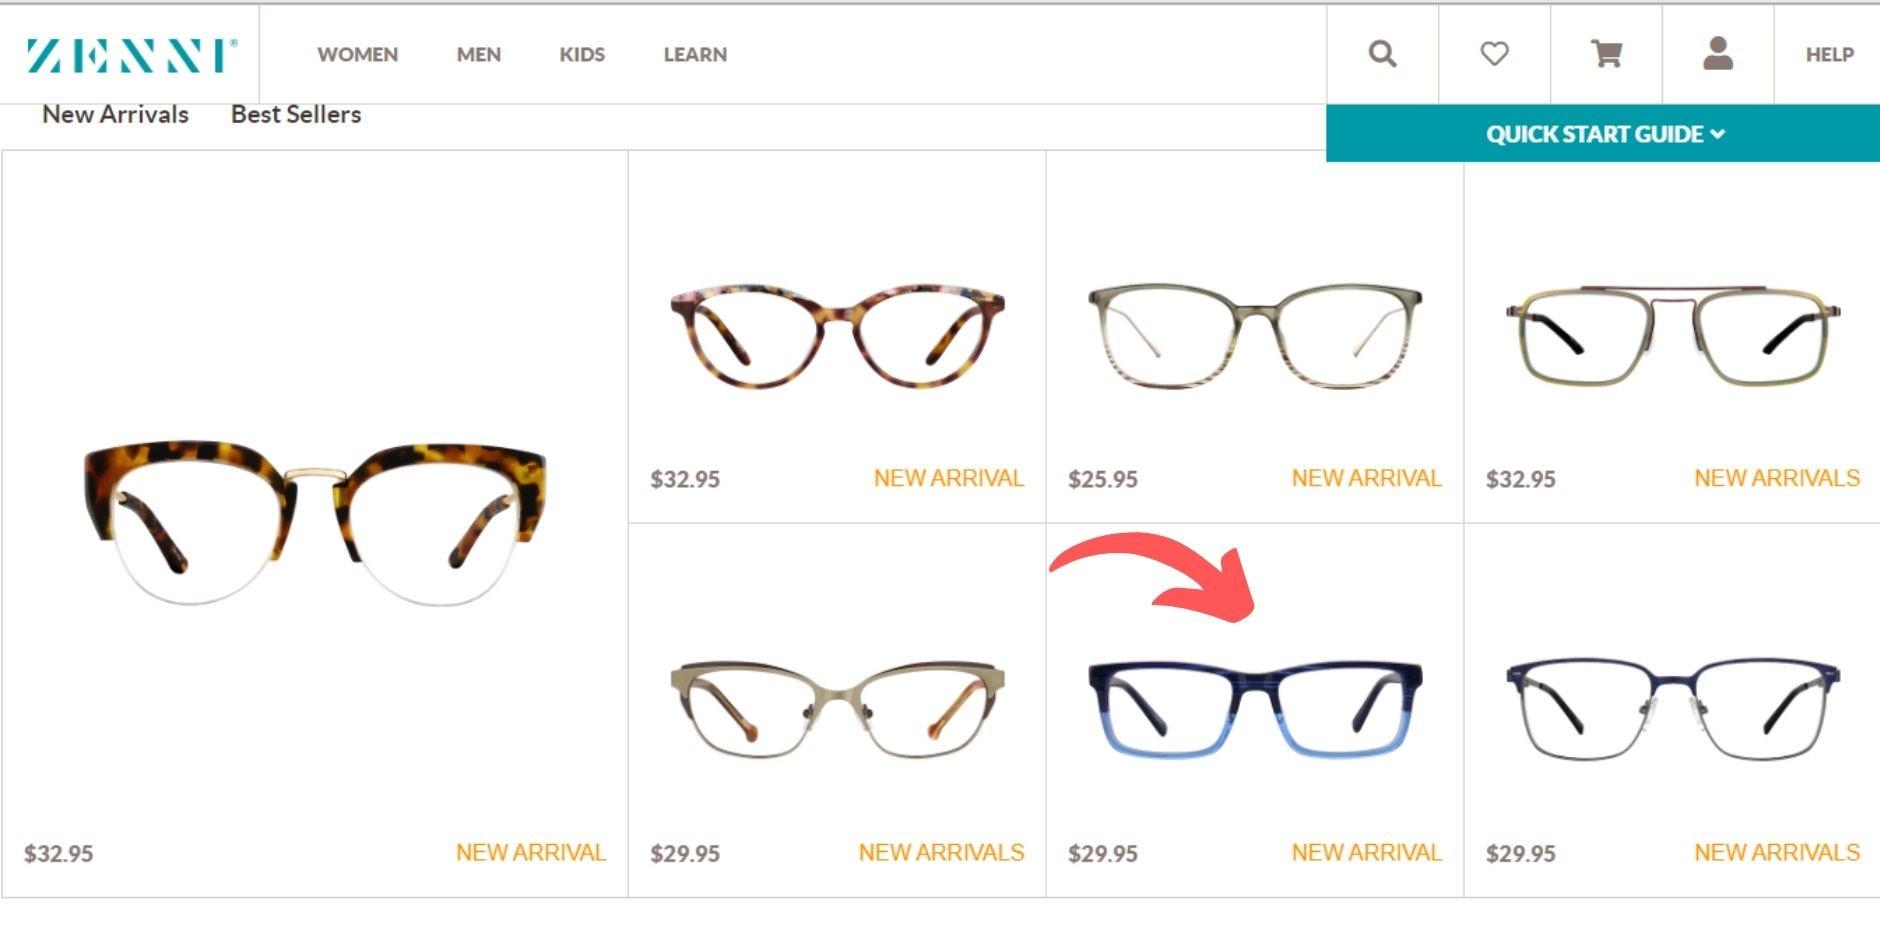 Zenni Optical Coupon, Promo Code, Discount: Up To 35% Off